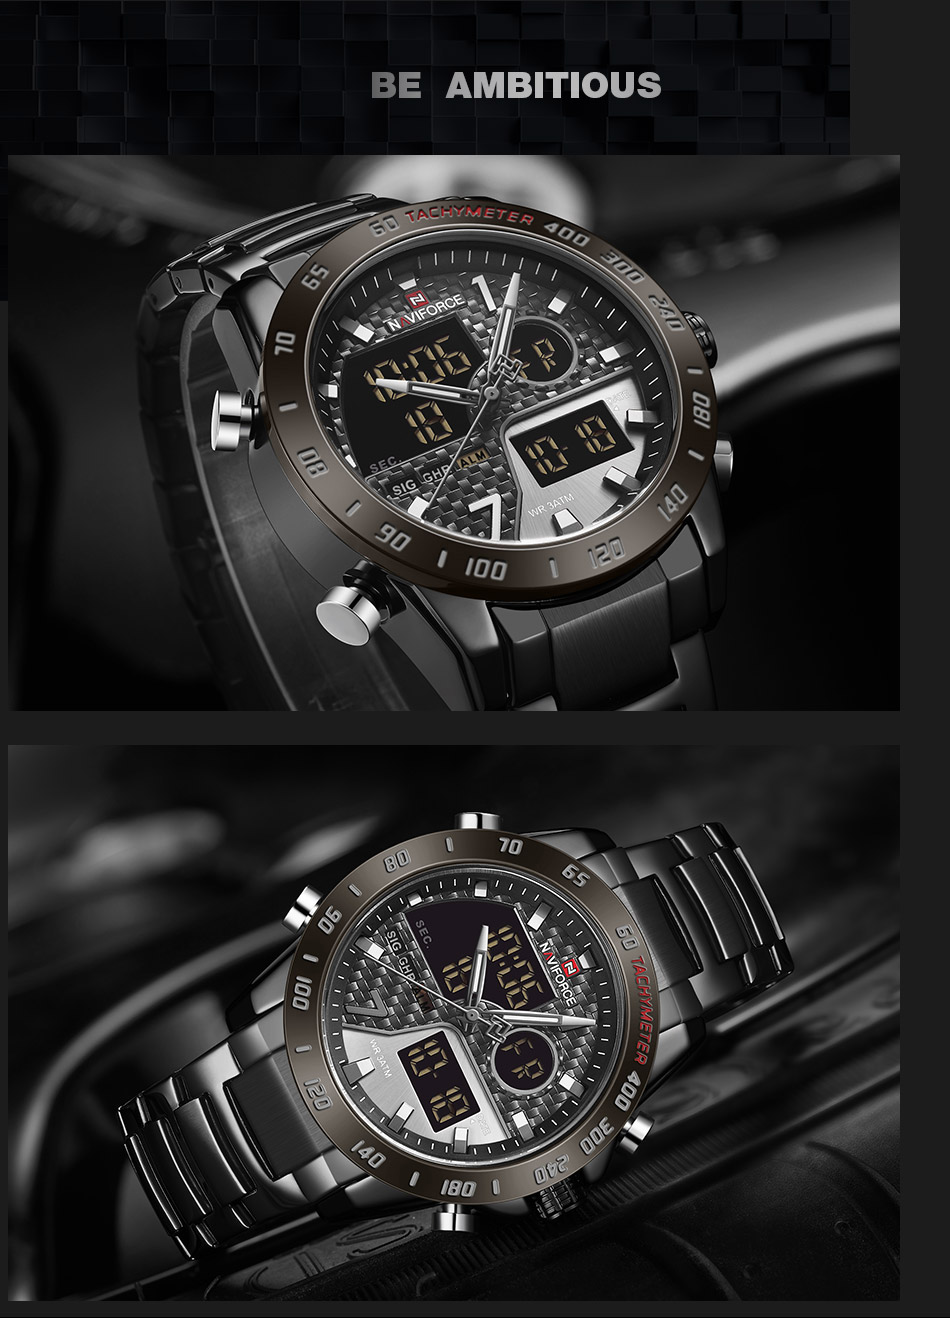 Hea054b37bb114f04a16e4852ee96c81d3 NAVIFORCE Men Digital Watch LED Sport Military Mens Quartz Wristwatch Male Luminous Waterproof Clock Watches Relogio Masculino